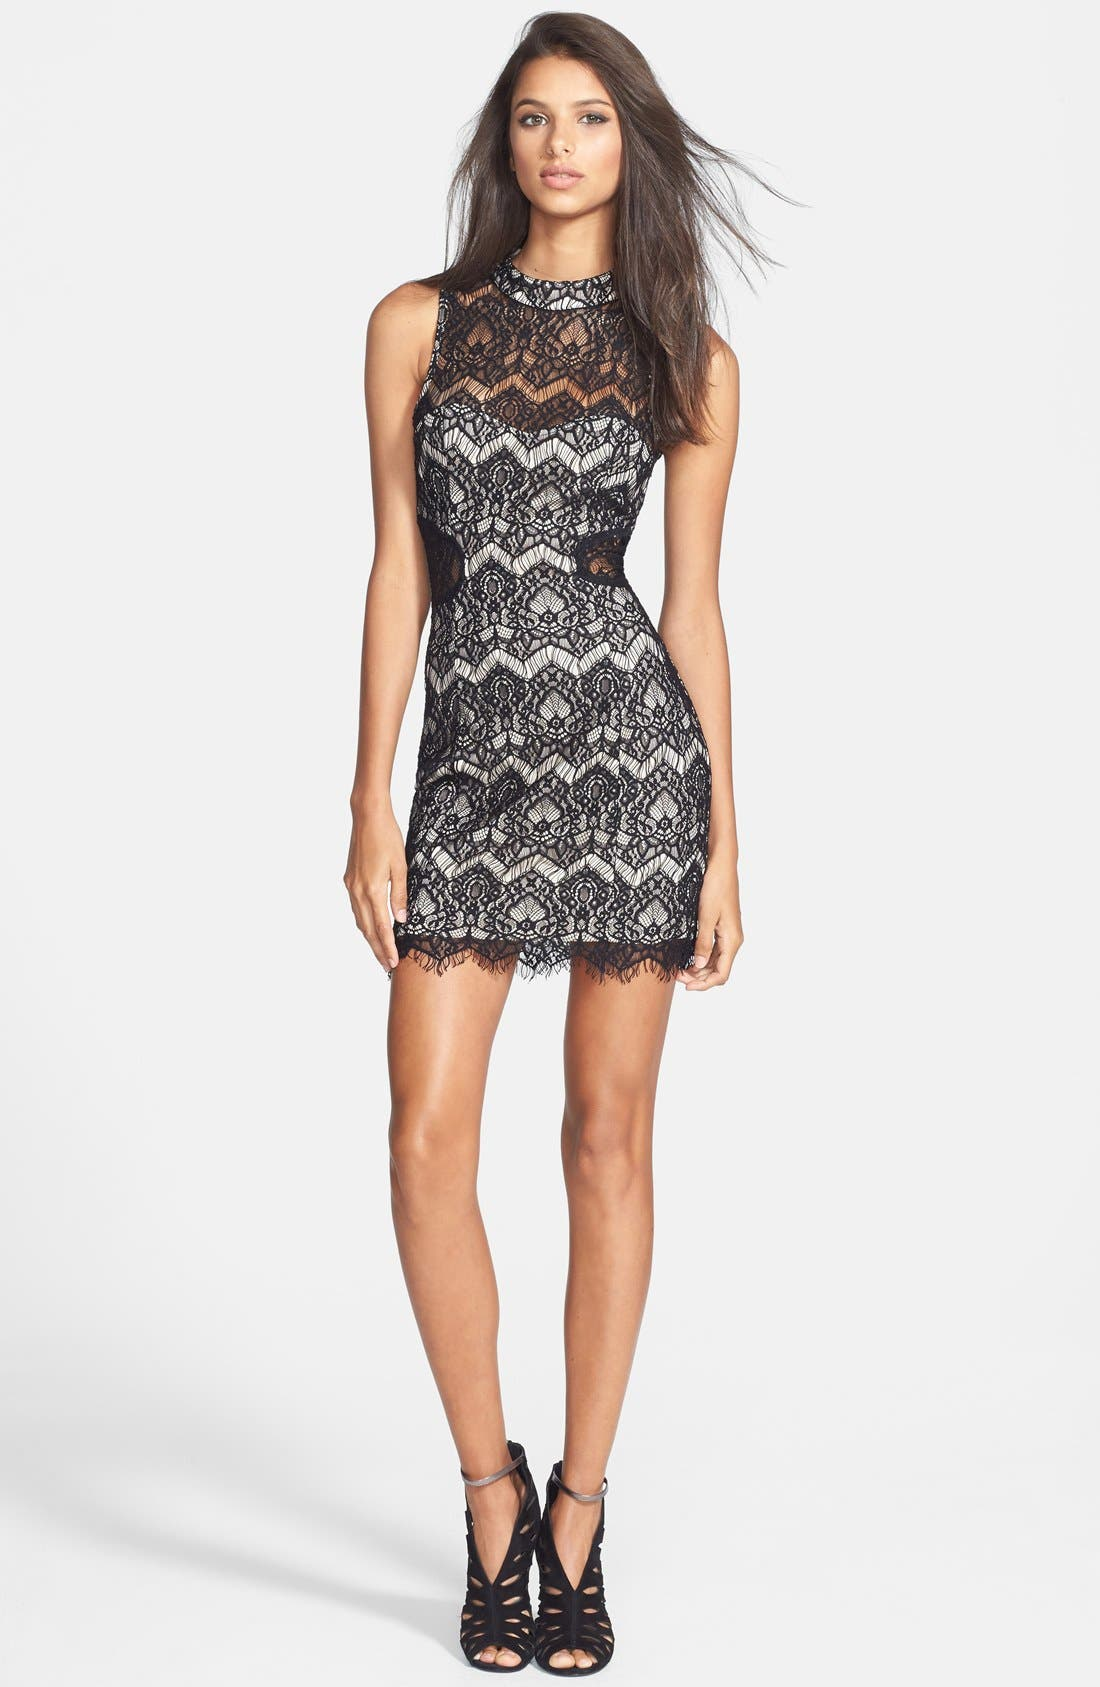 Alternate Image 1 Selected - Filtre Illusion Cutout Lace Body-Con Dress